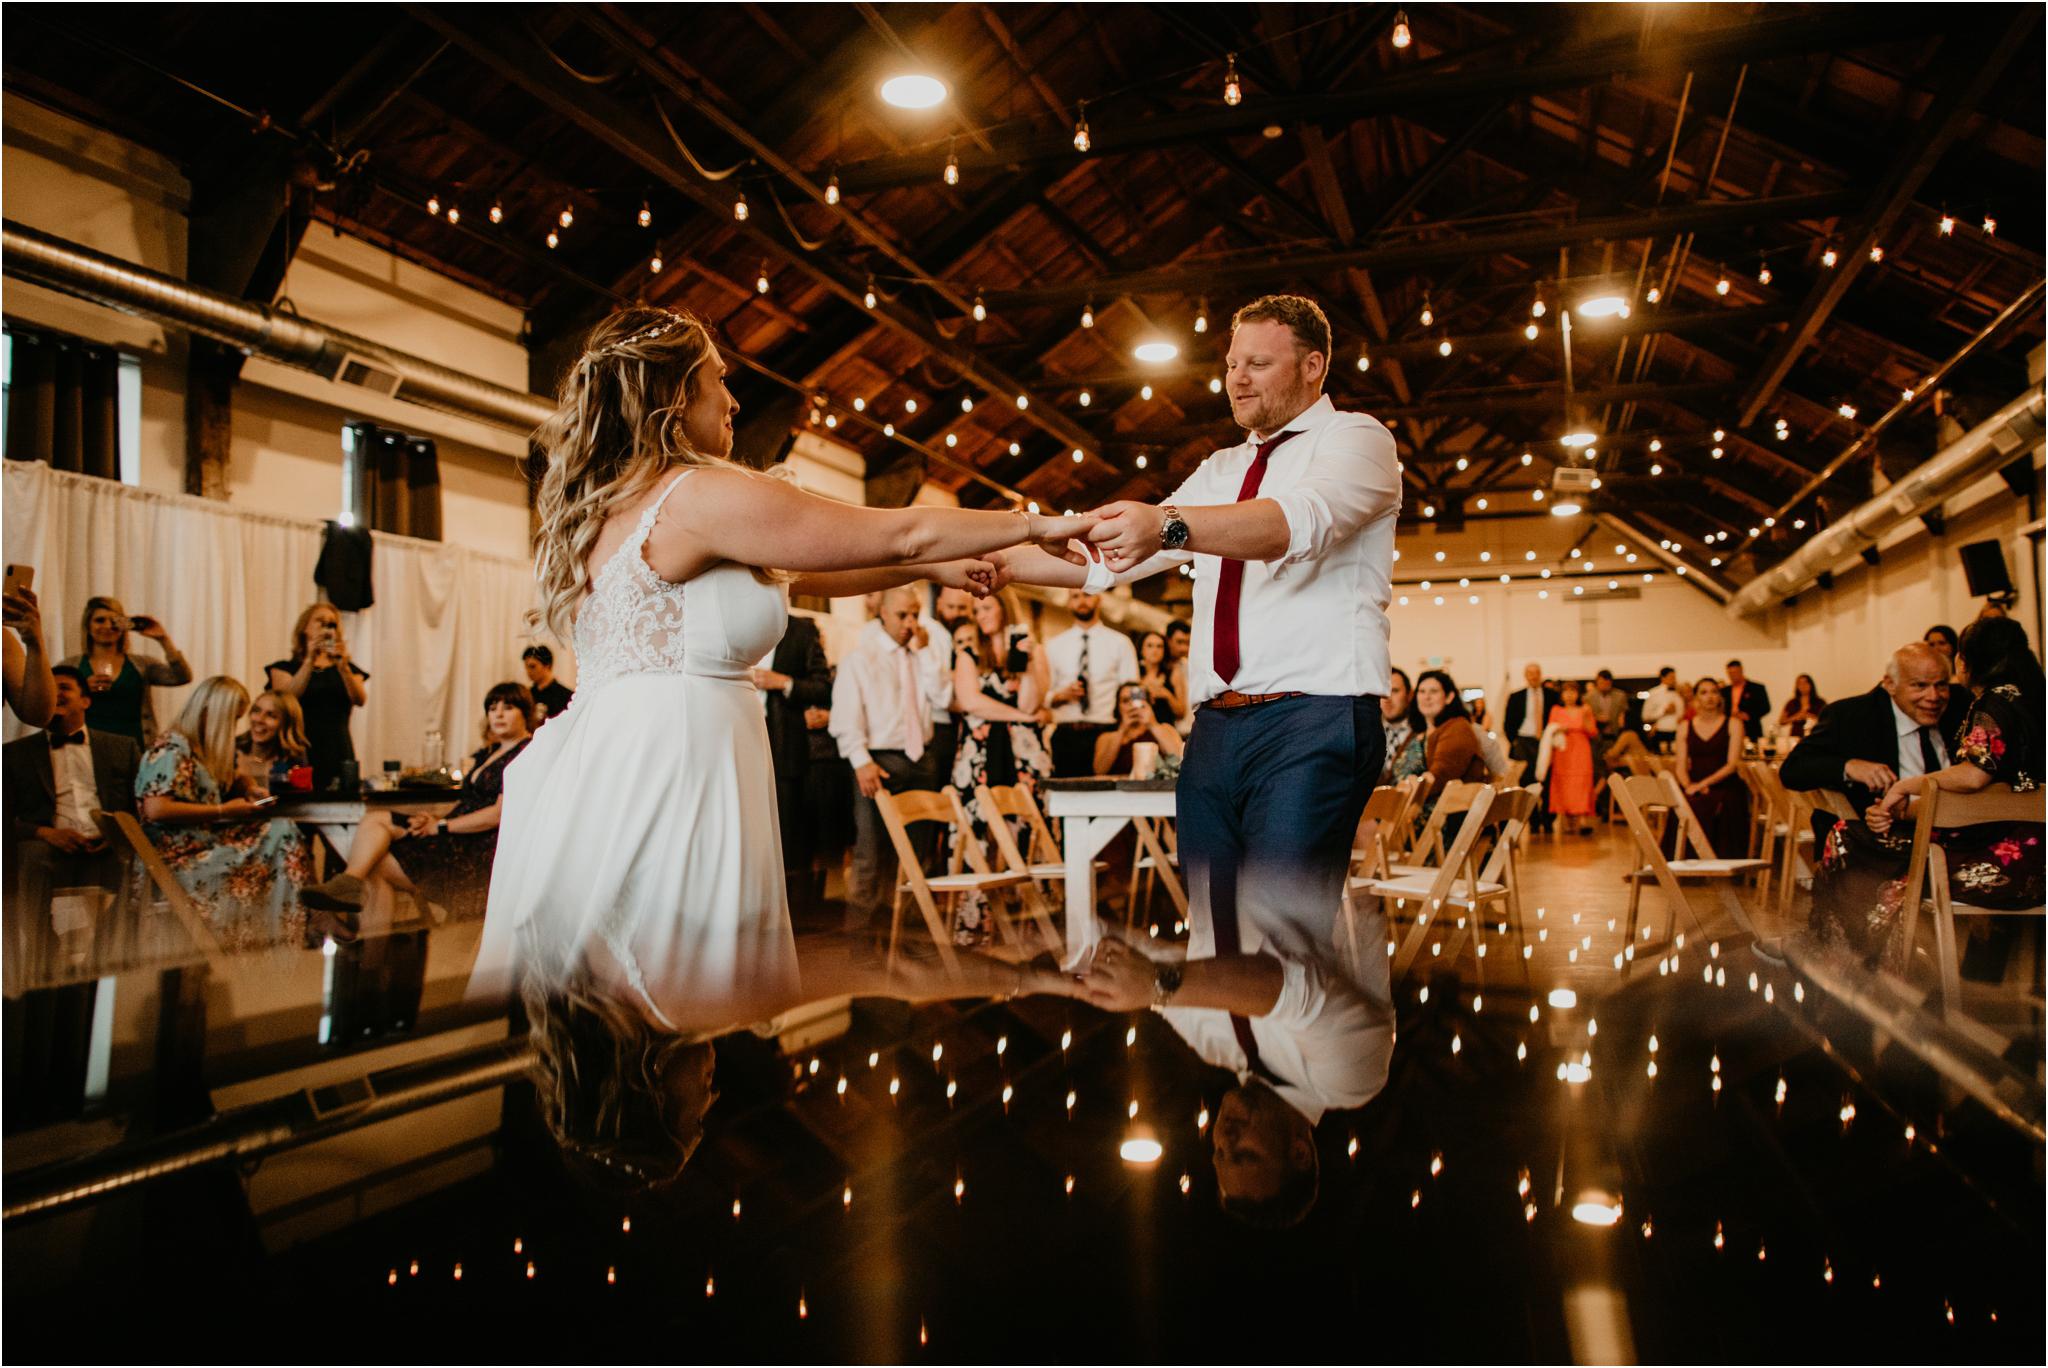 laura-and-matt-metropolist-urban-seattle-wedding-photographer-173.jpg